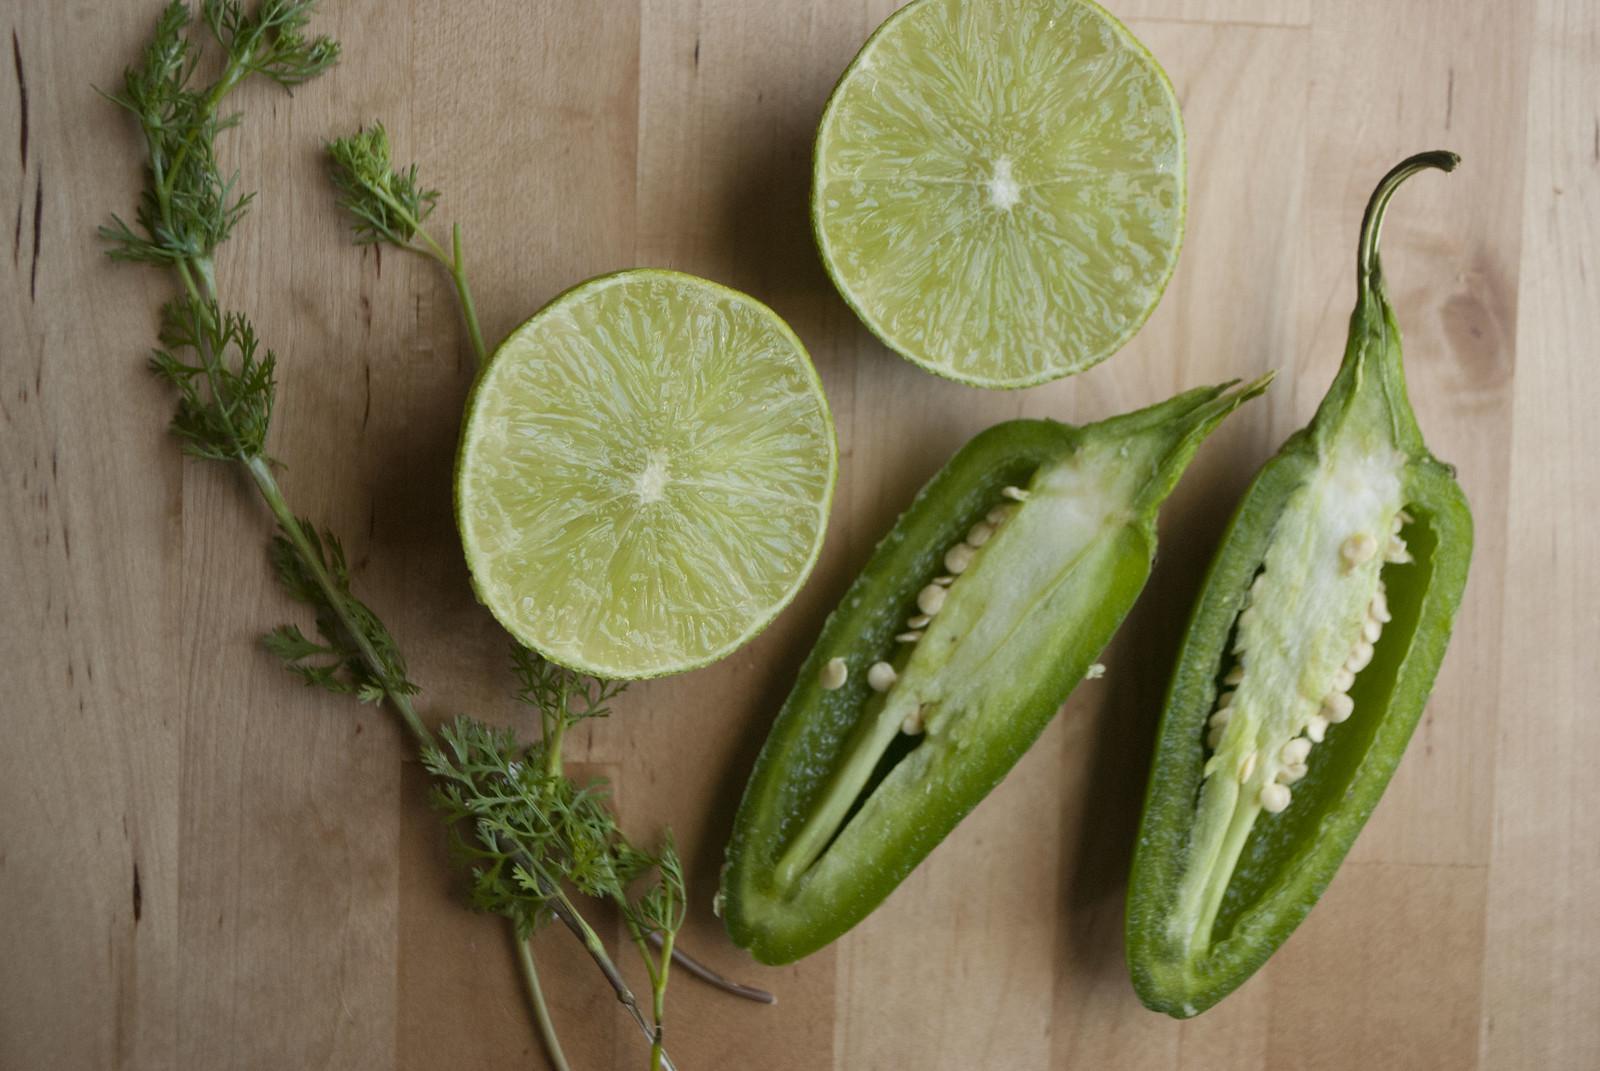 Avocado Pomegranate Salad with Cilantro-Lime Crema